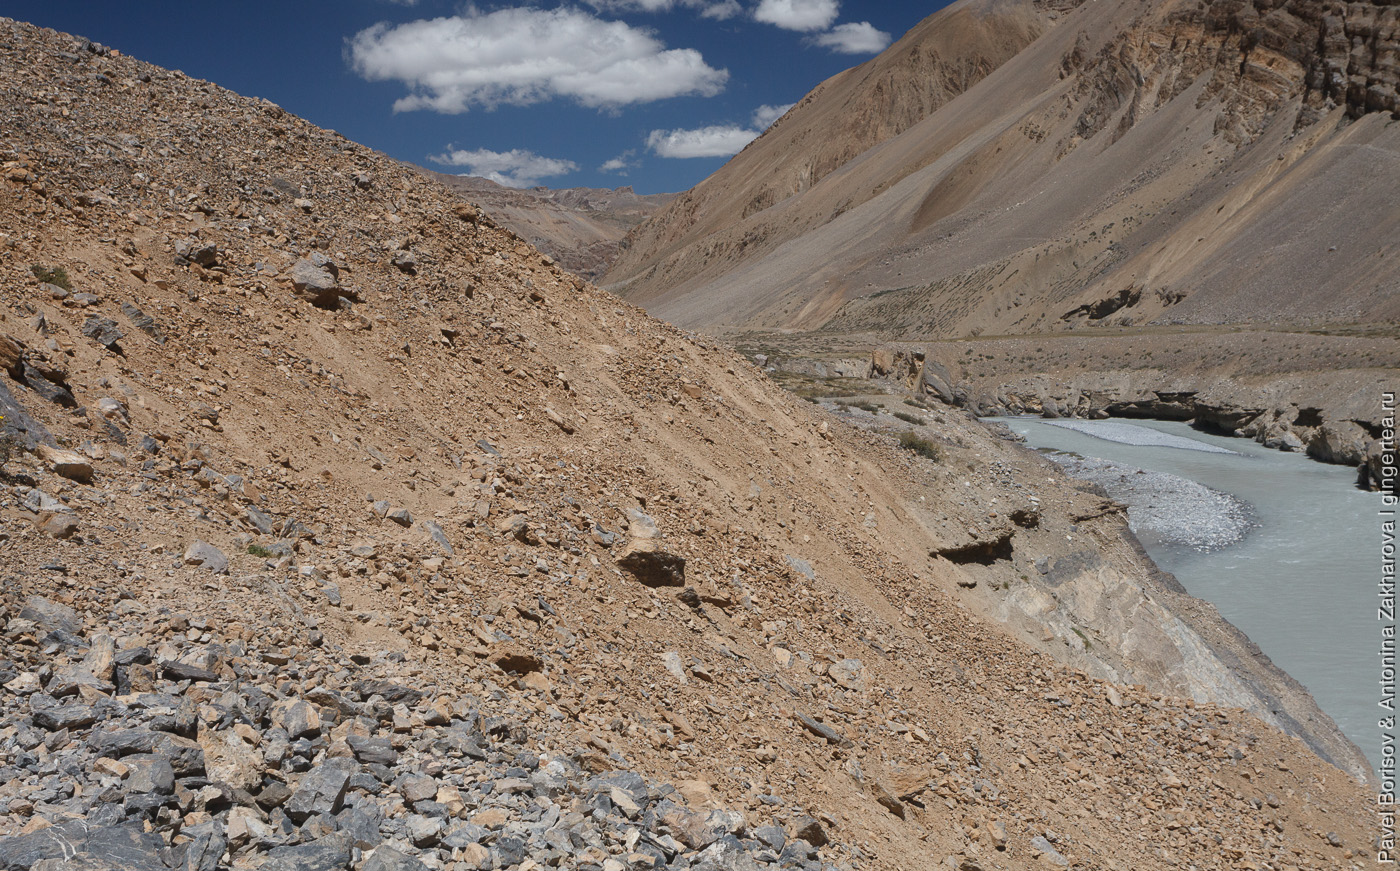 Каньон Малунга, Индийские Гималаи